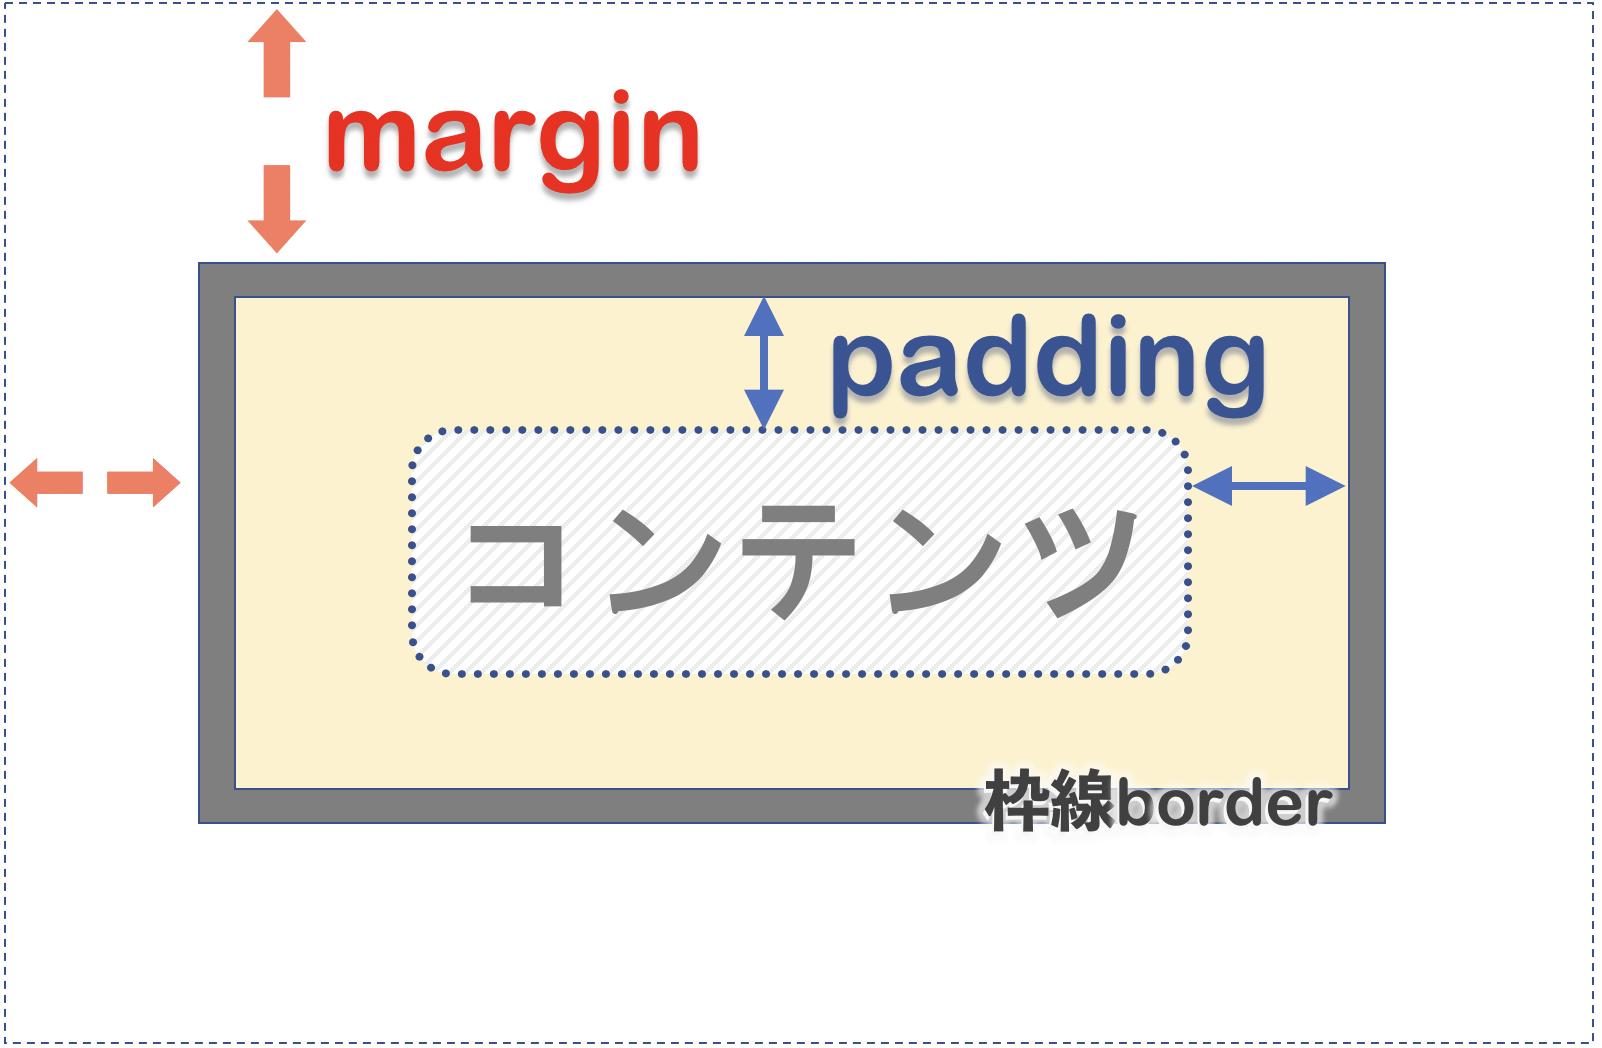 paddingとmarginとborderの位置付け